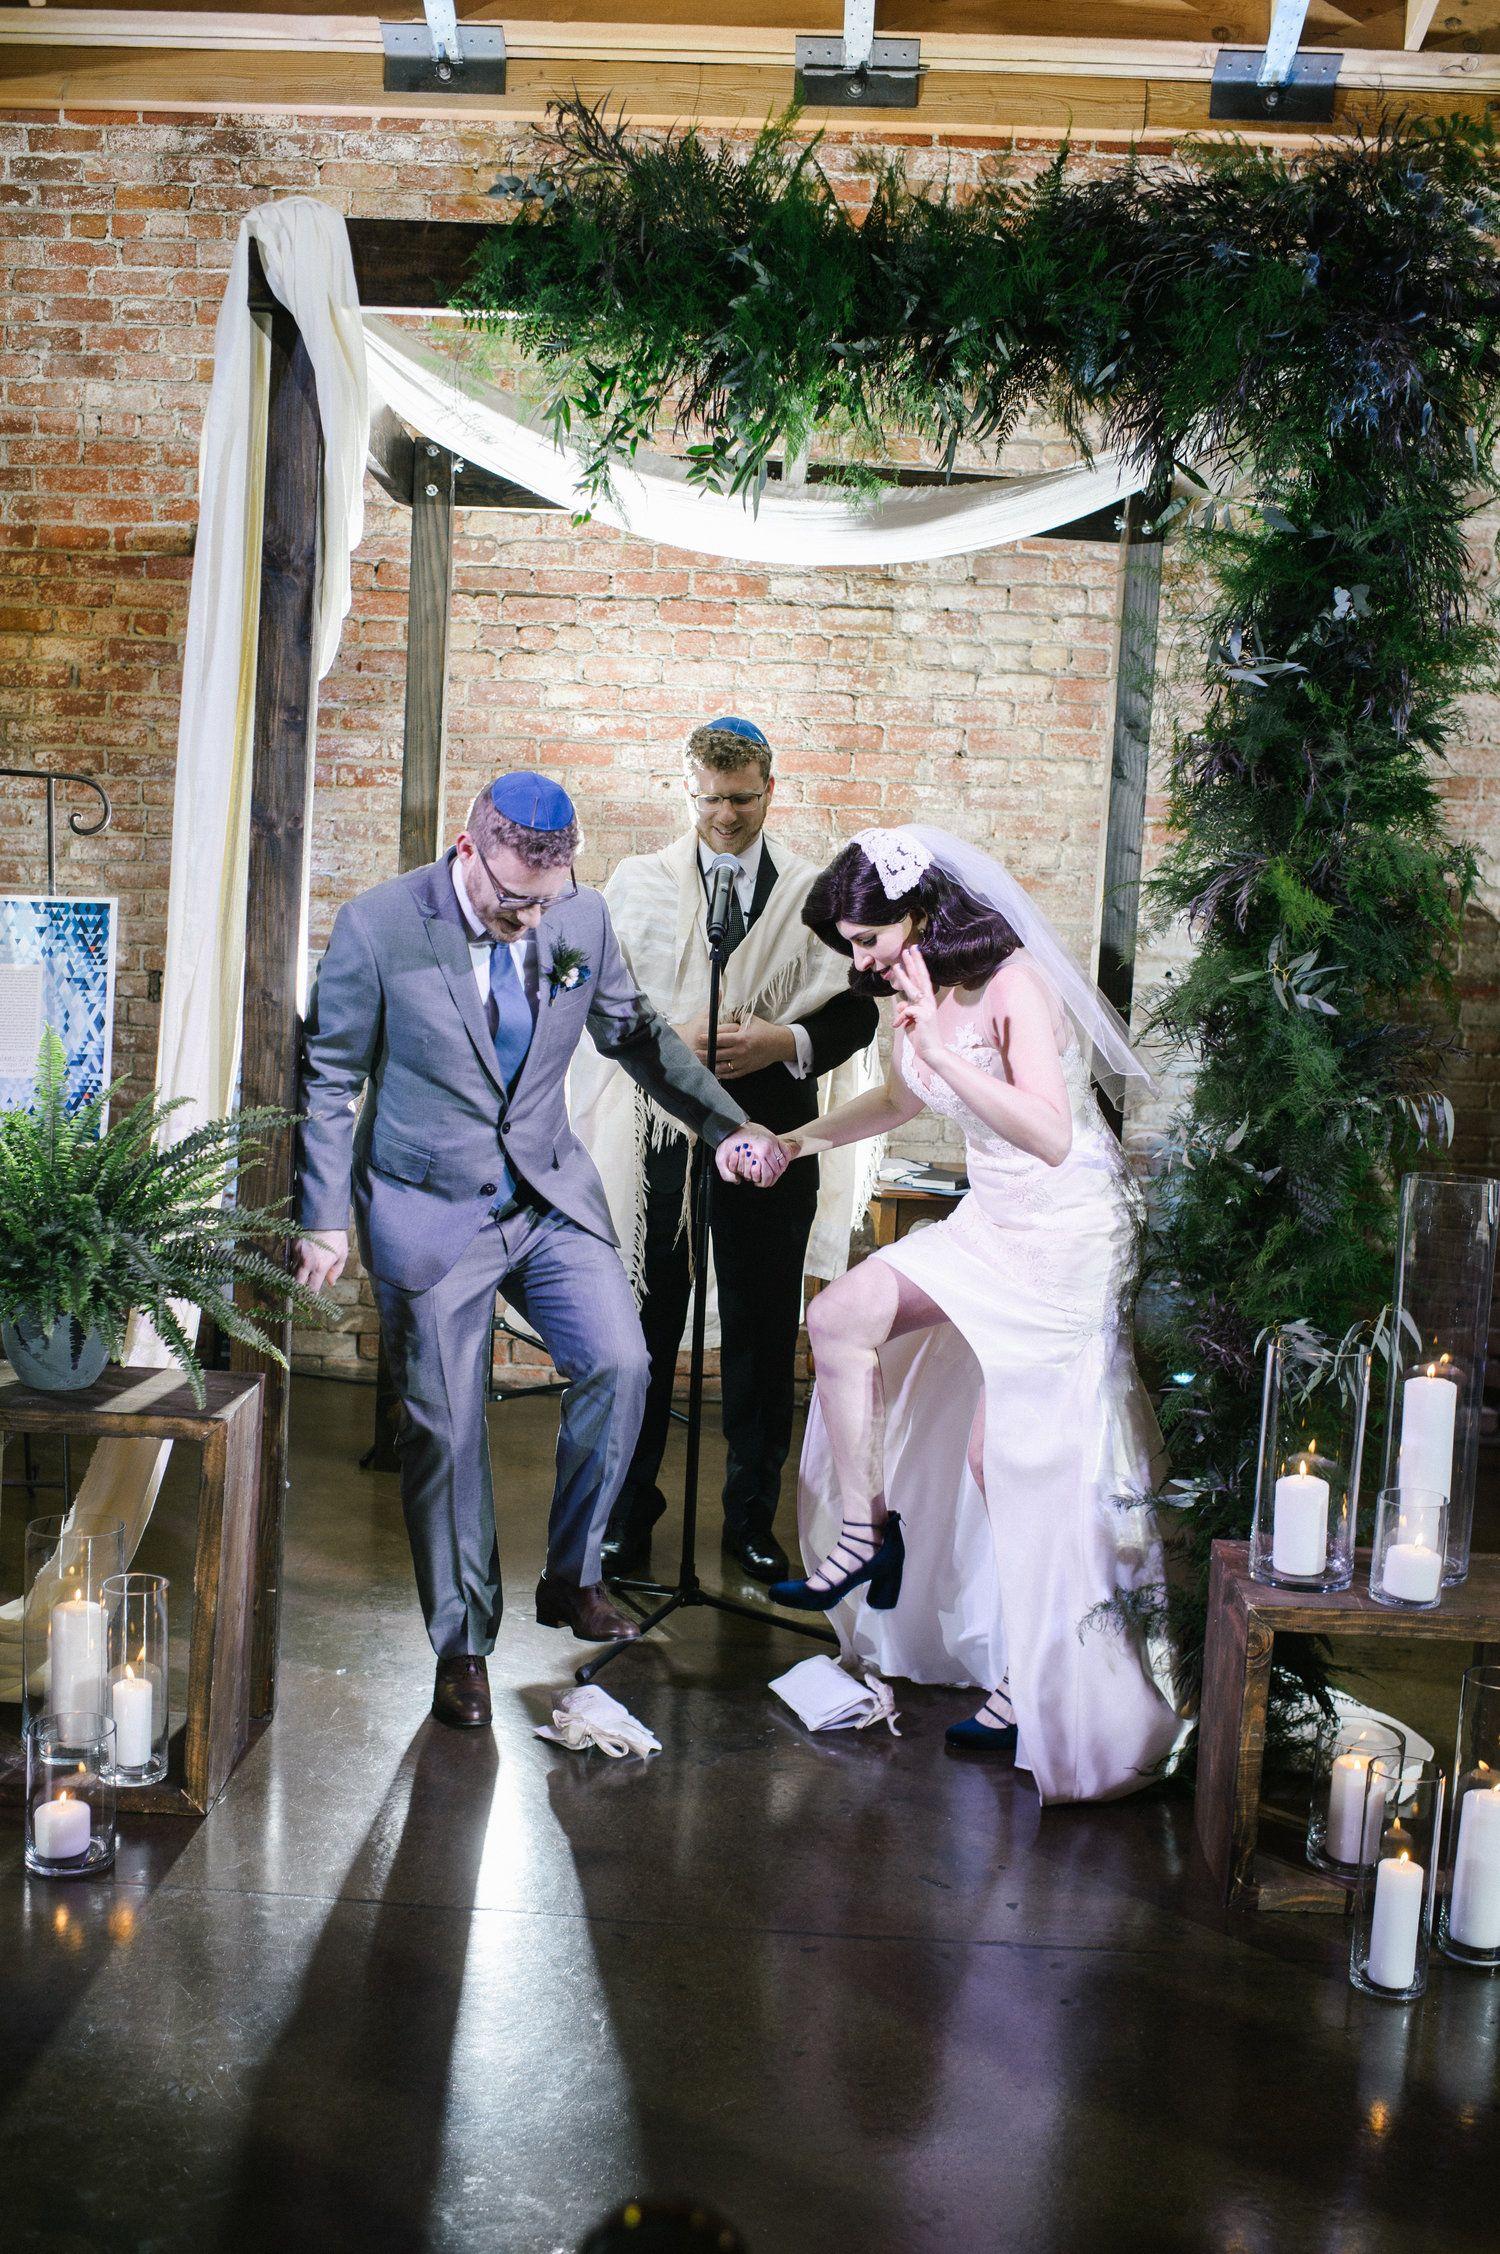 A Modern Jewish Wedding Ceremony Guide Rituals, History